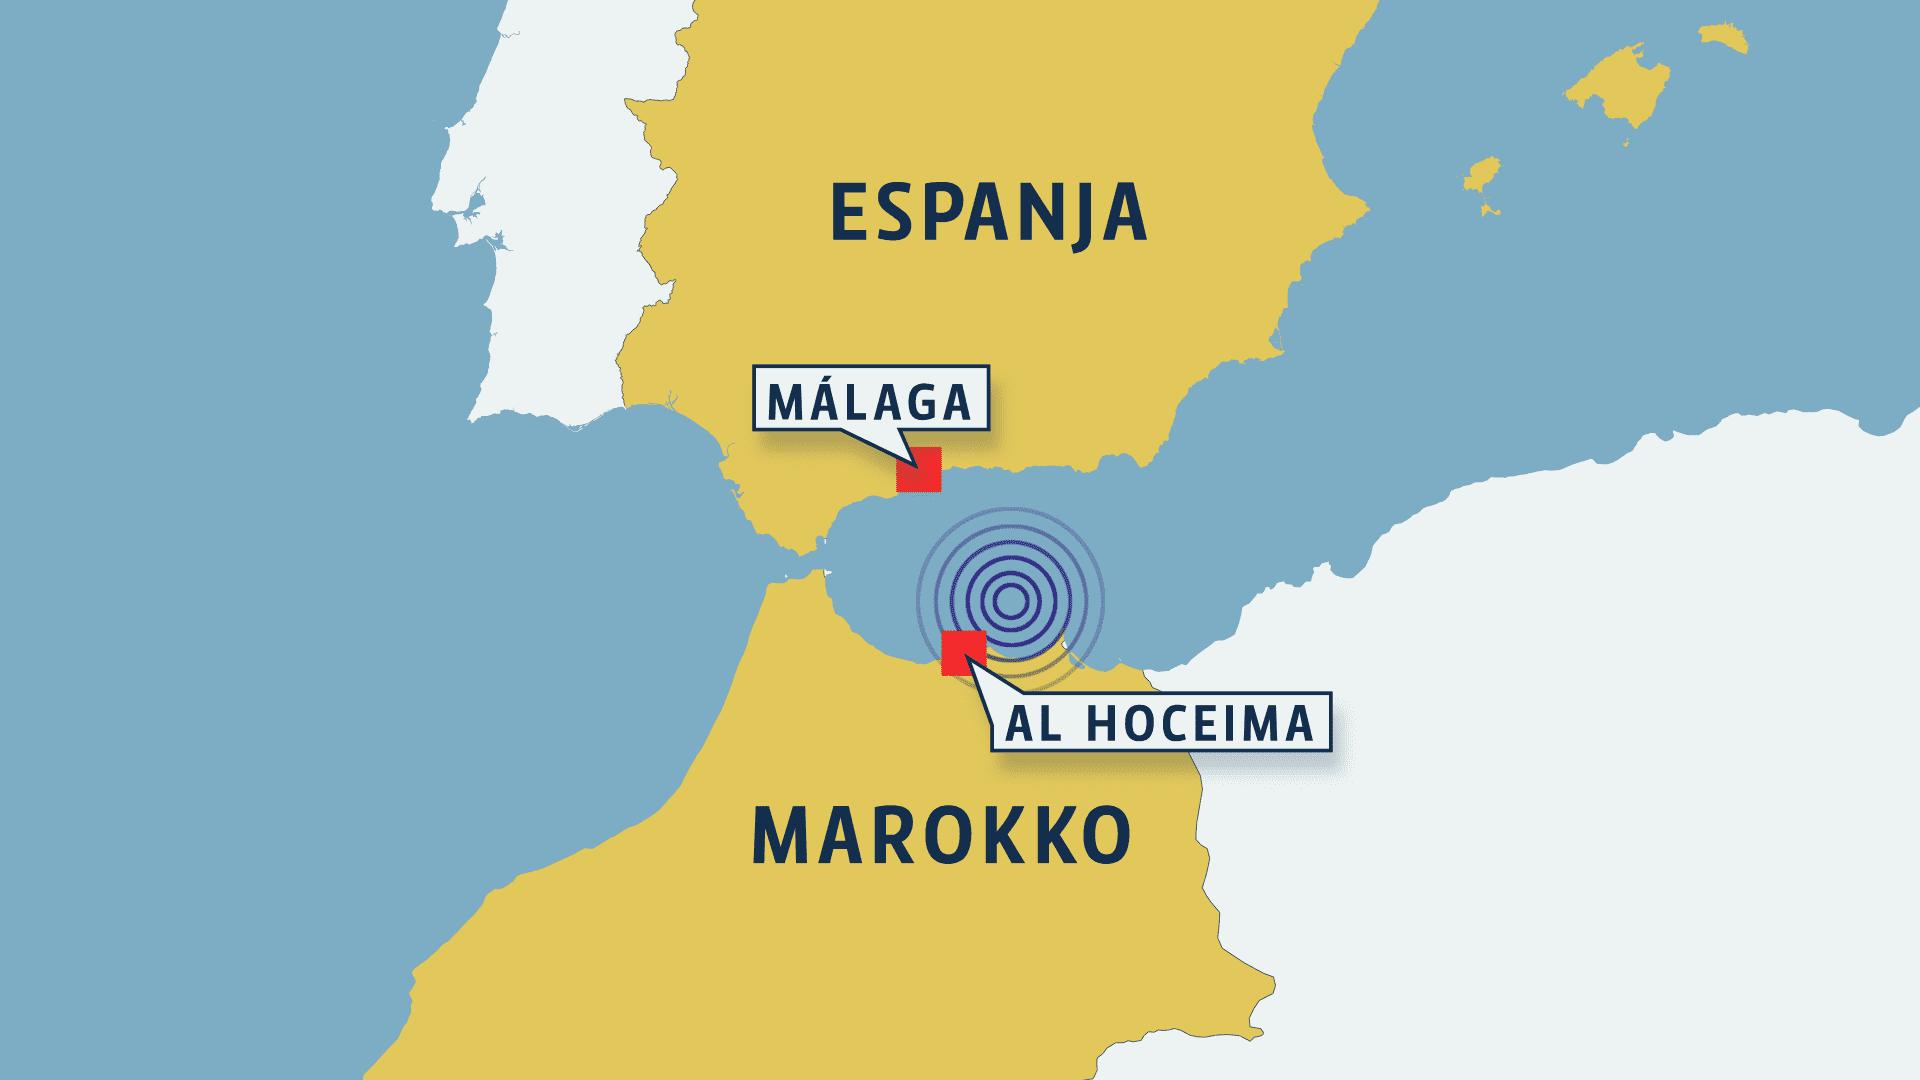 Espanjan ja Marokon kartta